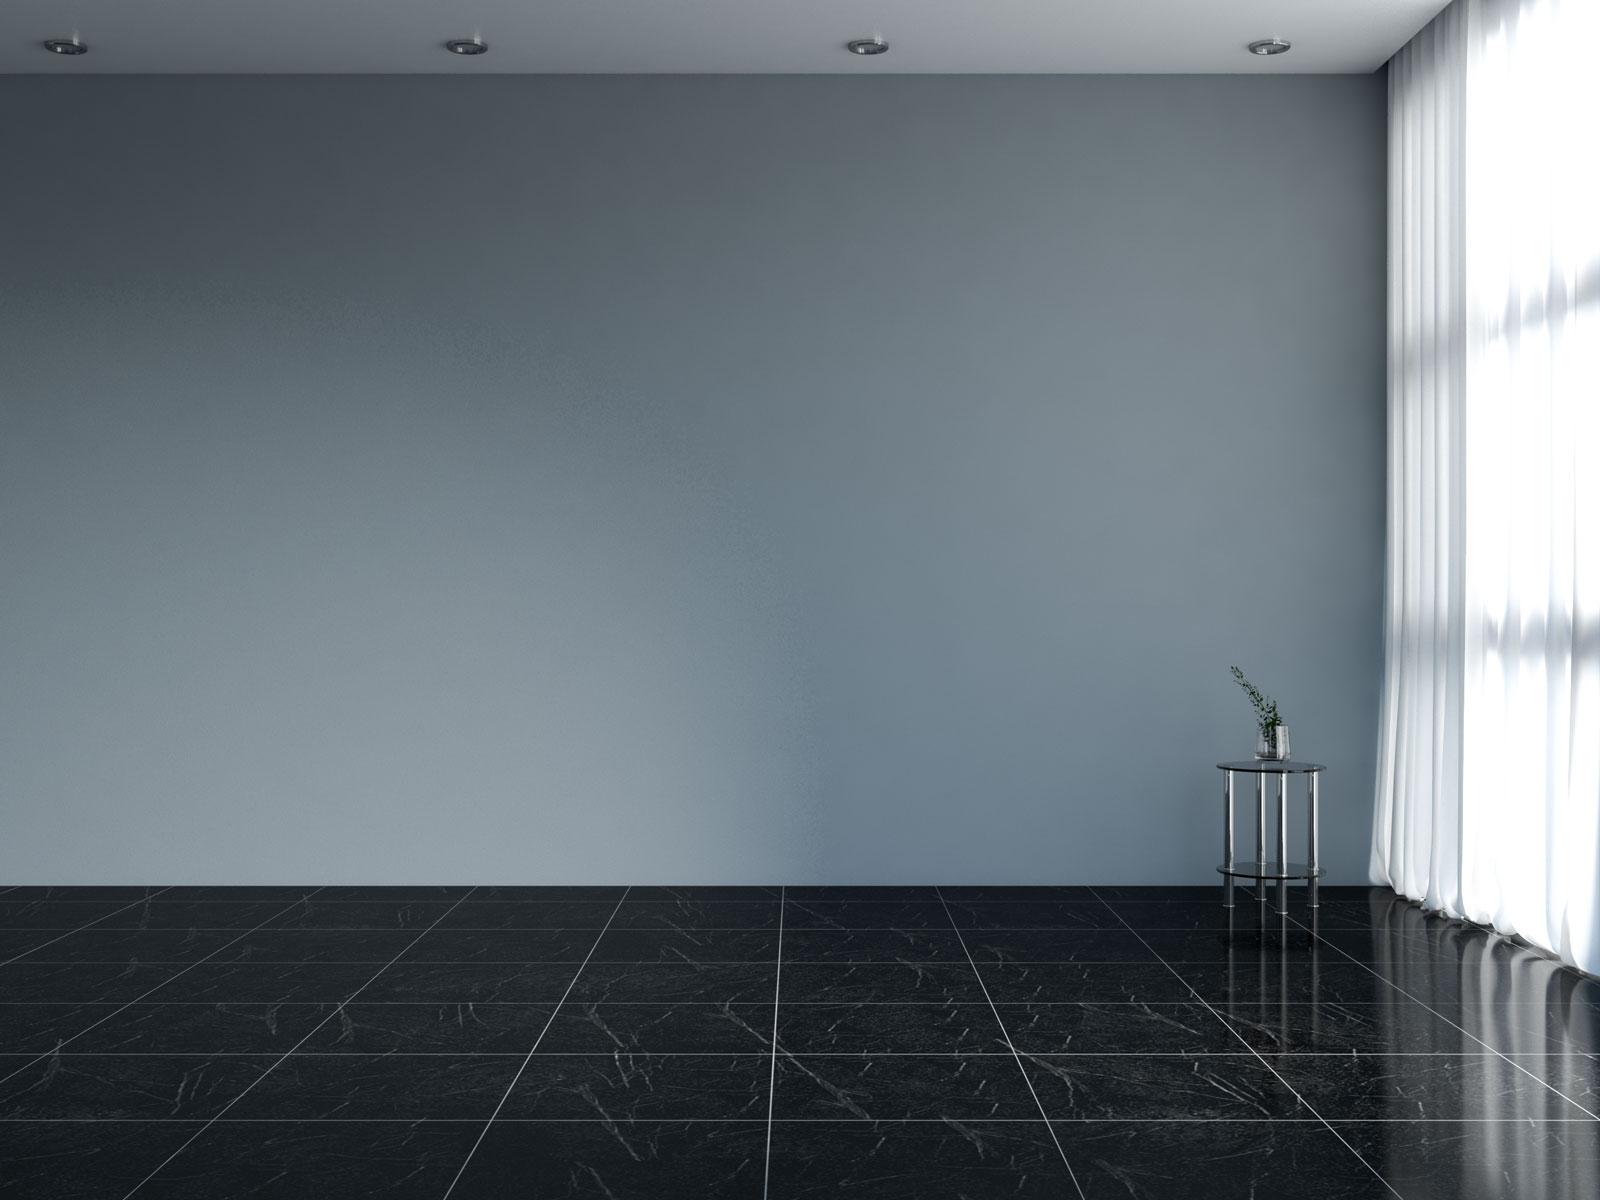 Steel gray wall with black tile floors